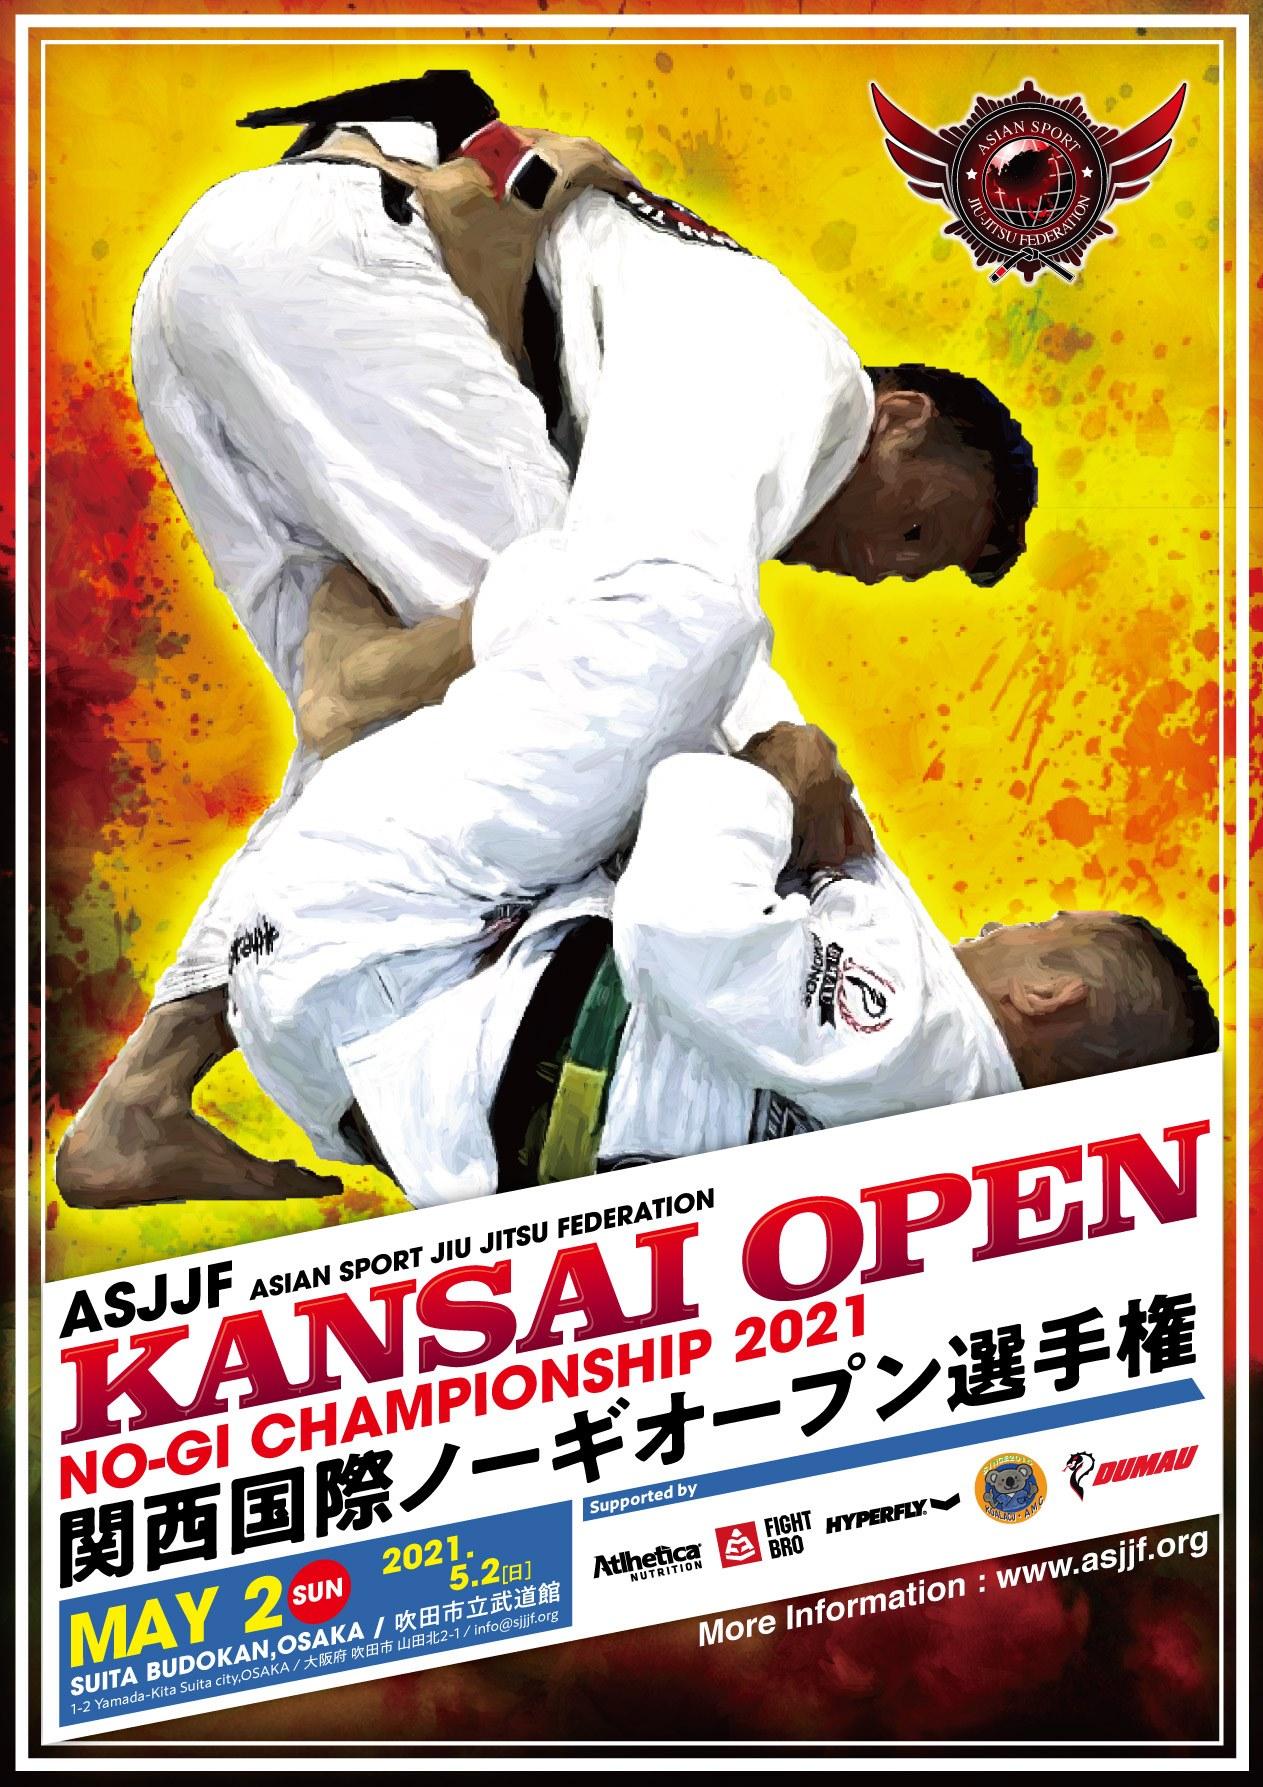 asjjf kansai open no-gi championship 2021 (関西国際ノーギ柔術オープン選手権)